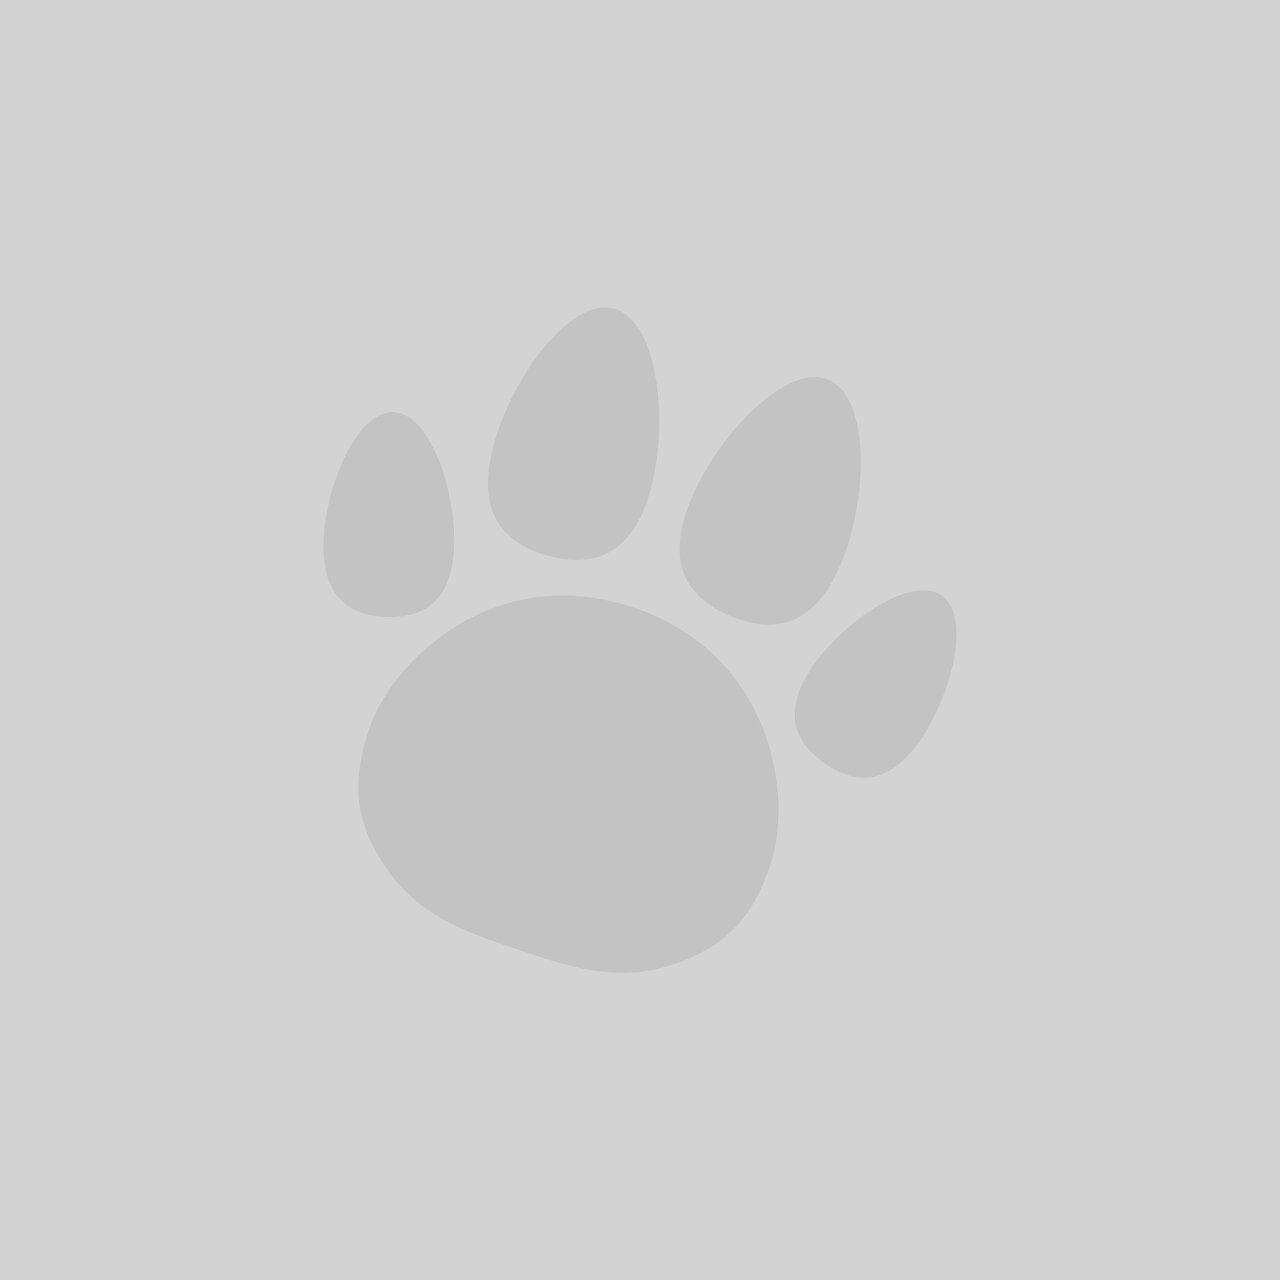 Boxer Dog Expert Book